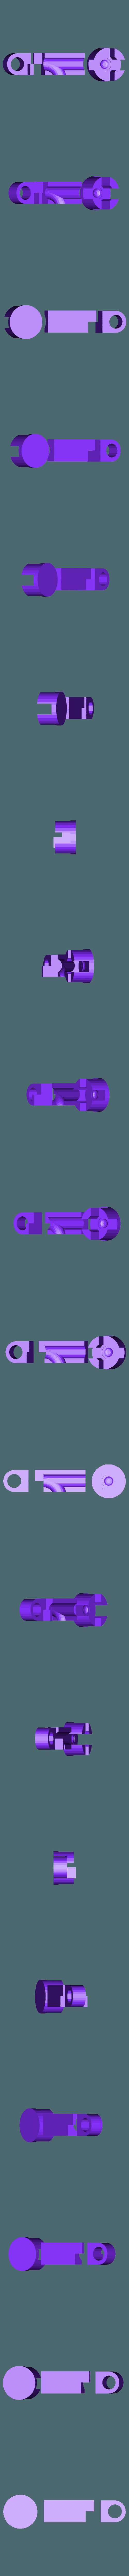 big_turret_pipe_tools_hm.stl Download free STL file Big Plasma Cannon Turret • 3D printing design, JtStrait72